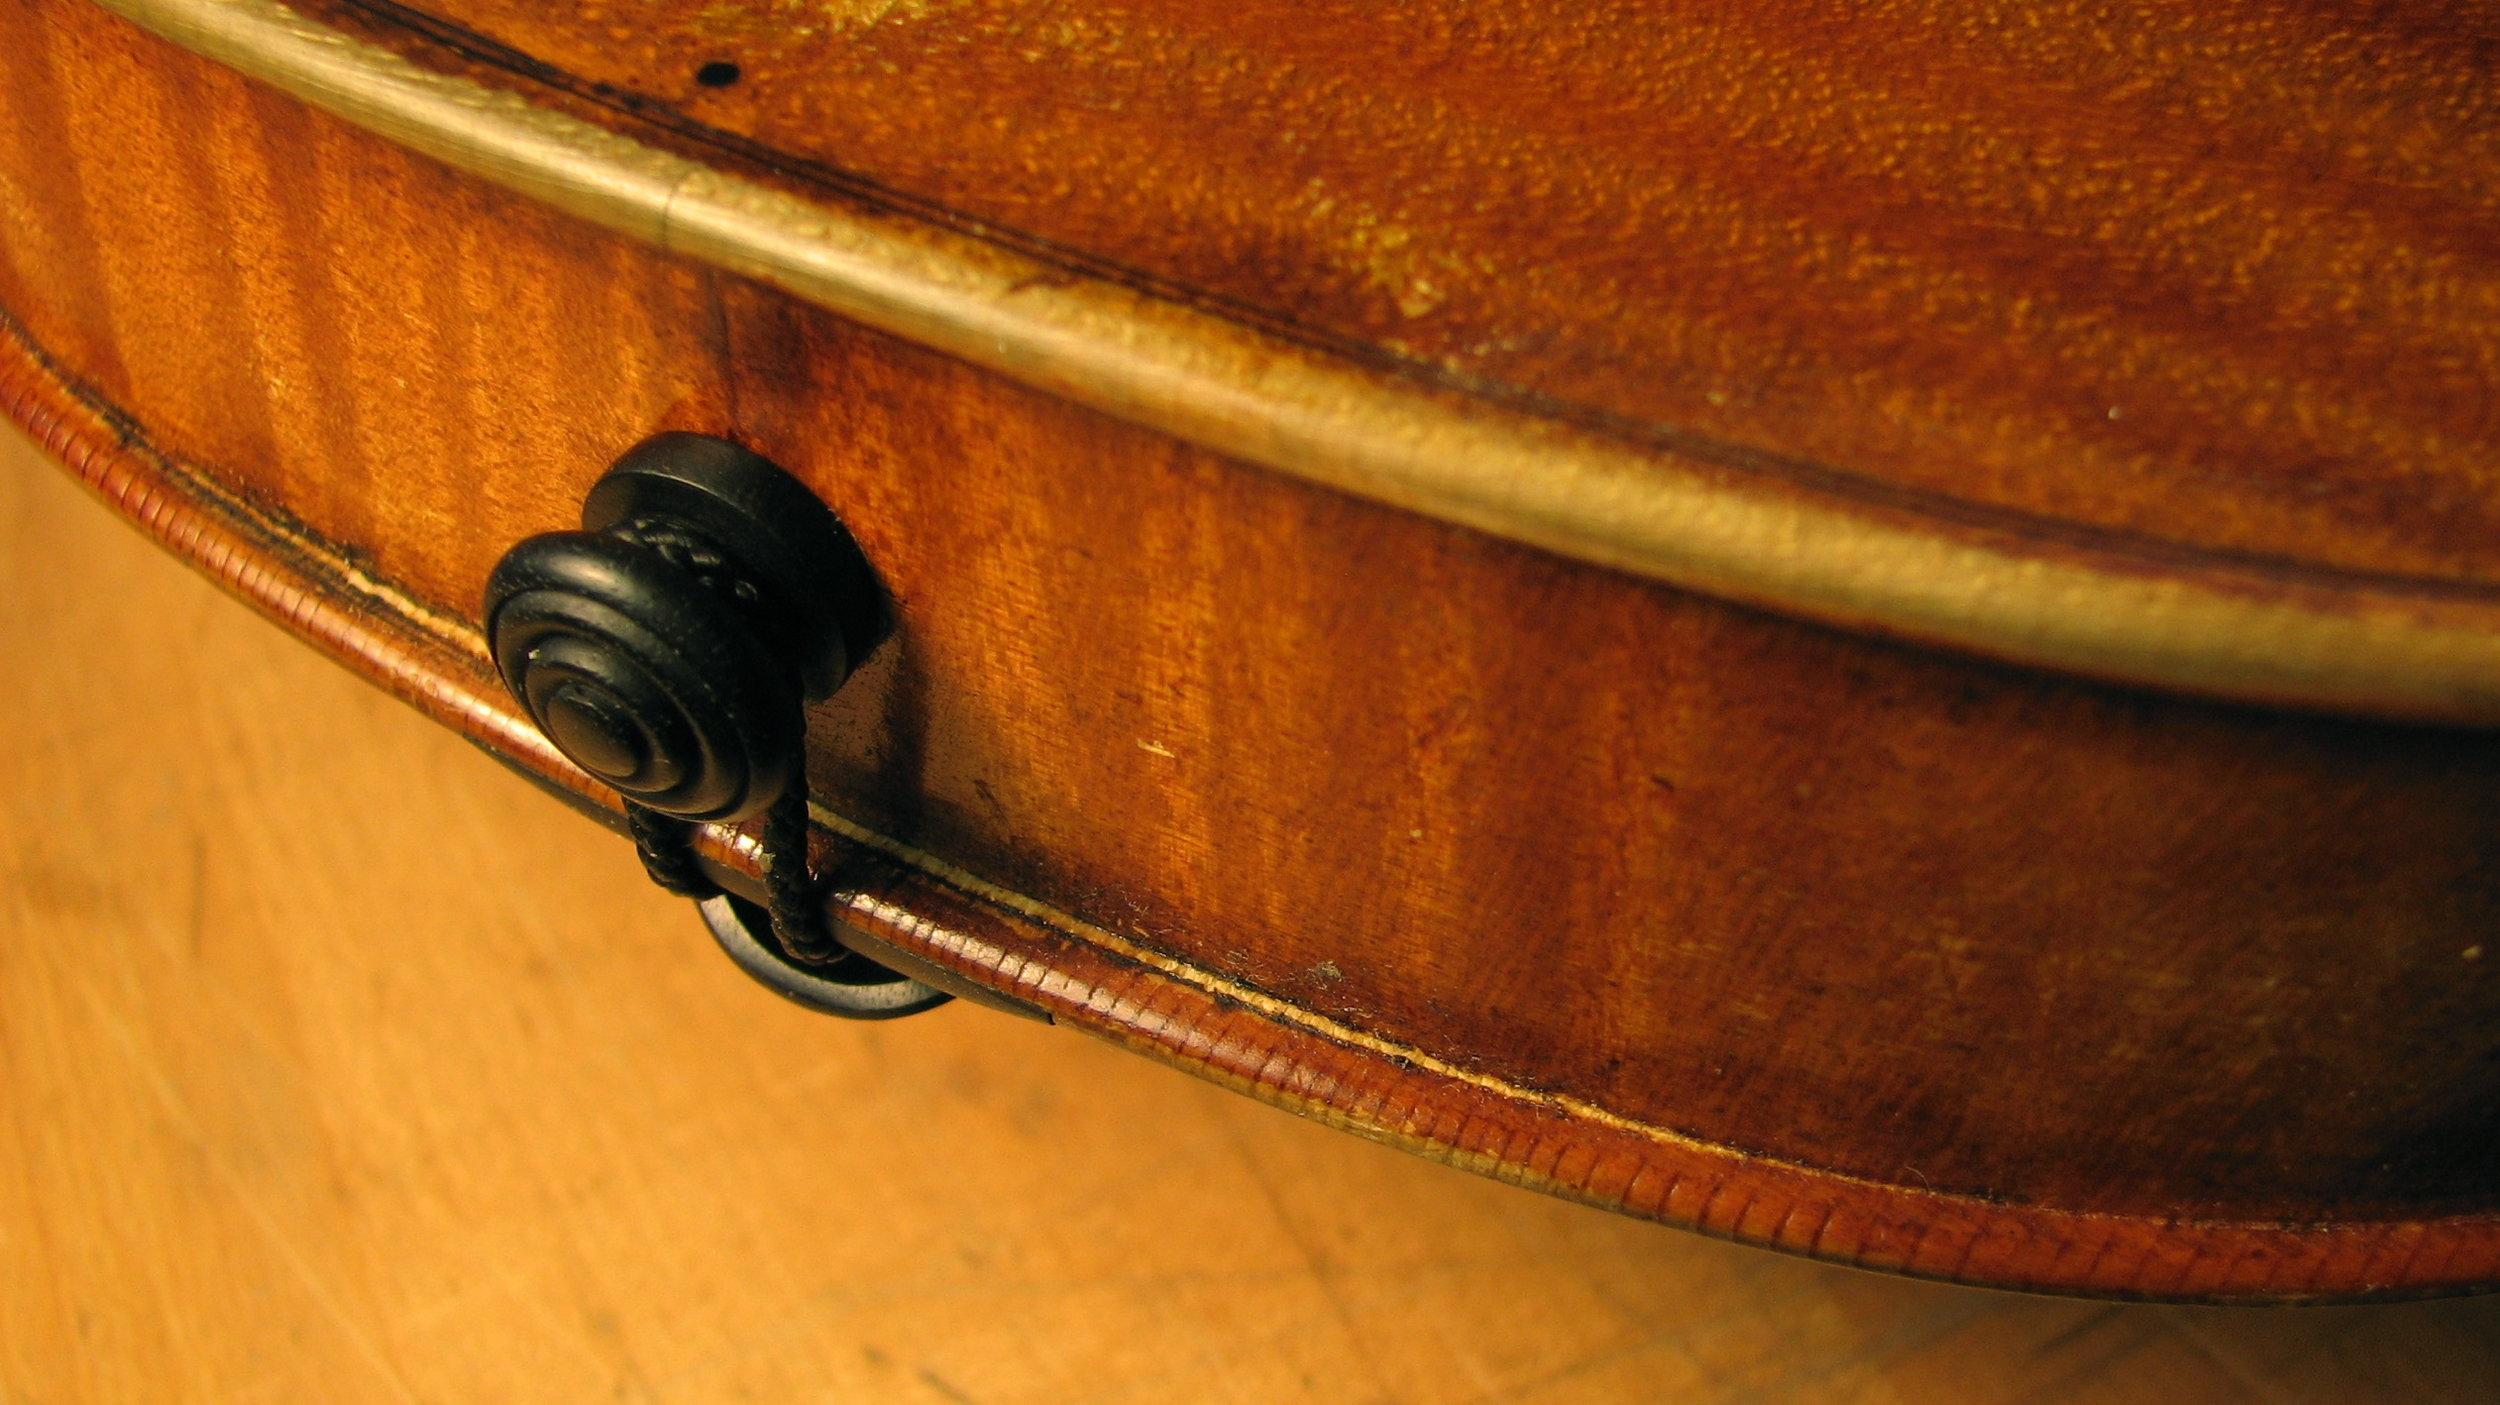 violin seam.jpg